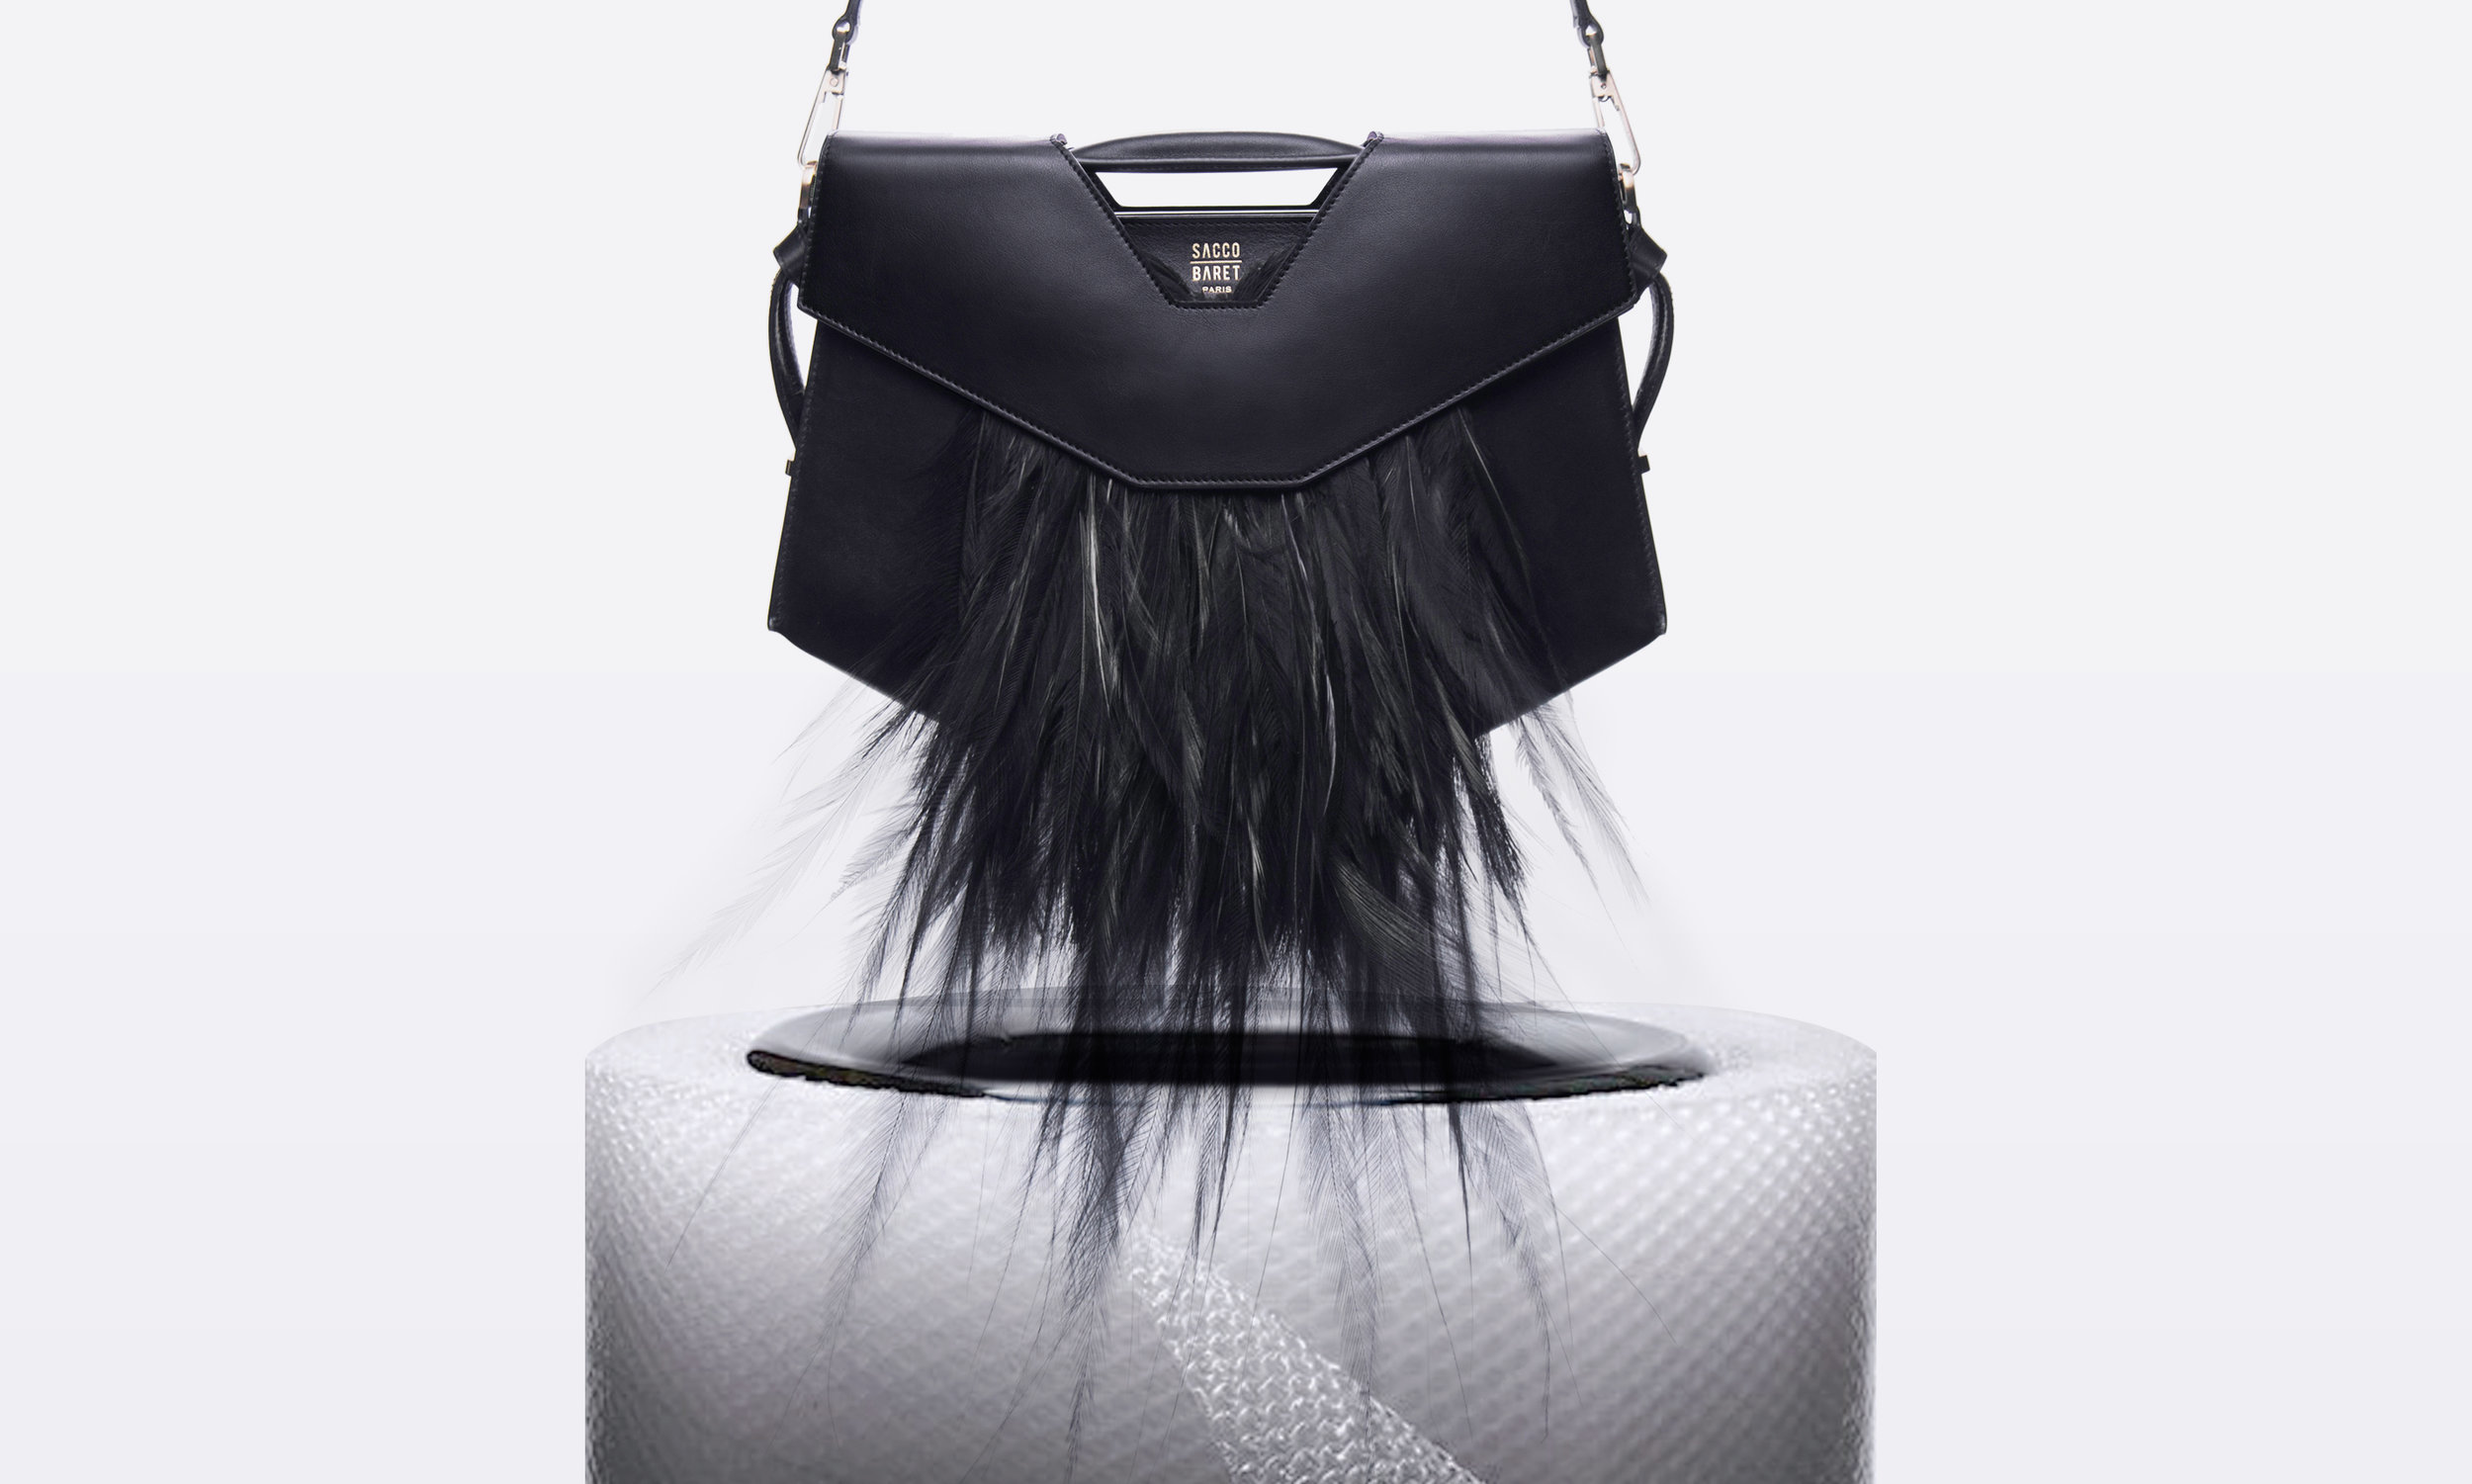 Sacco-Baret-Vendome-Artisanal-Selection-BubbleWrap-Black-Paradis-Palais-de-tokyo.jpg